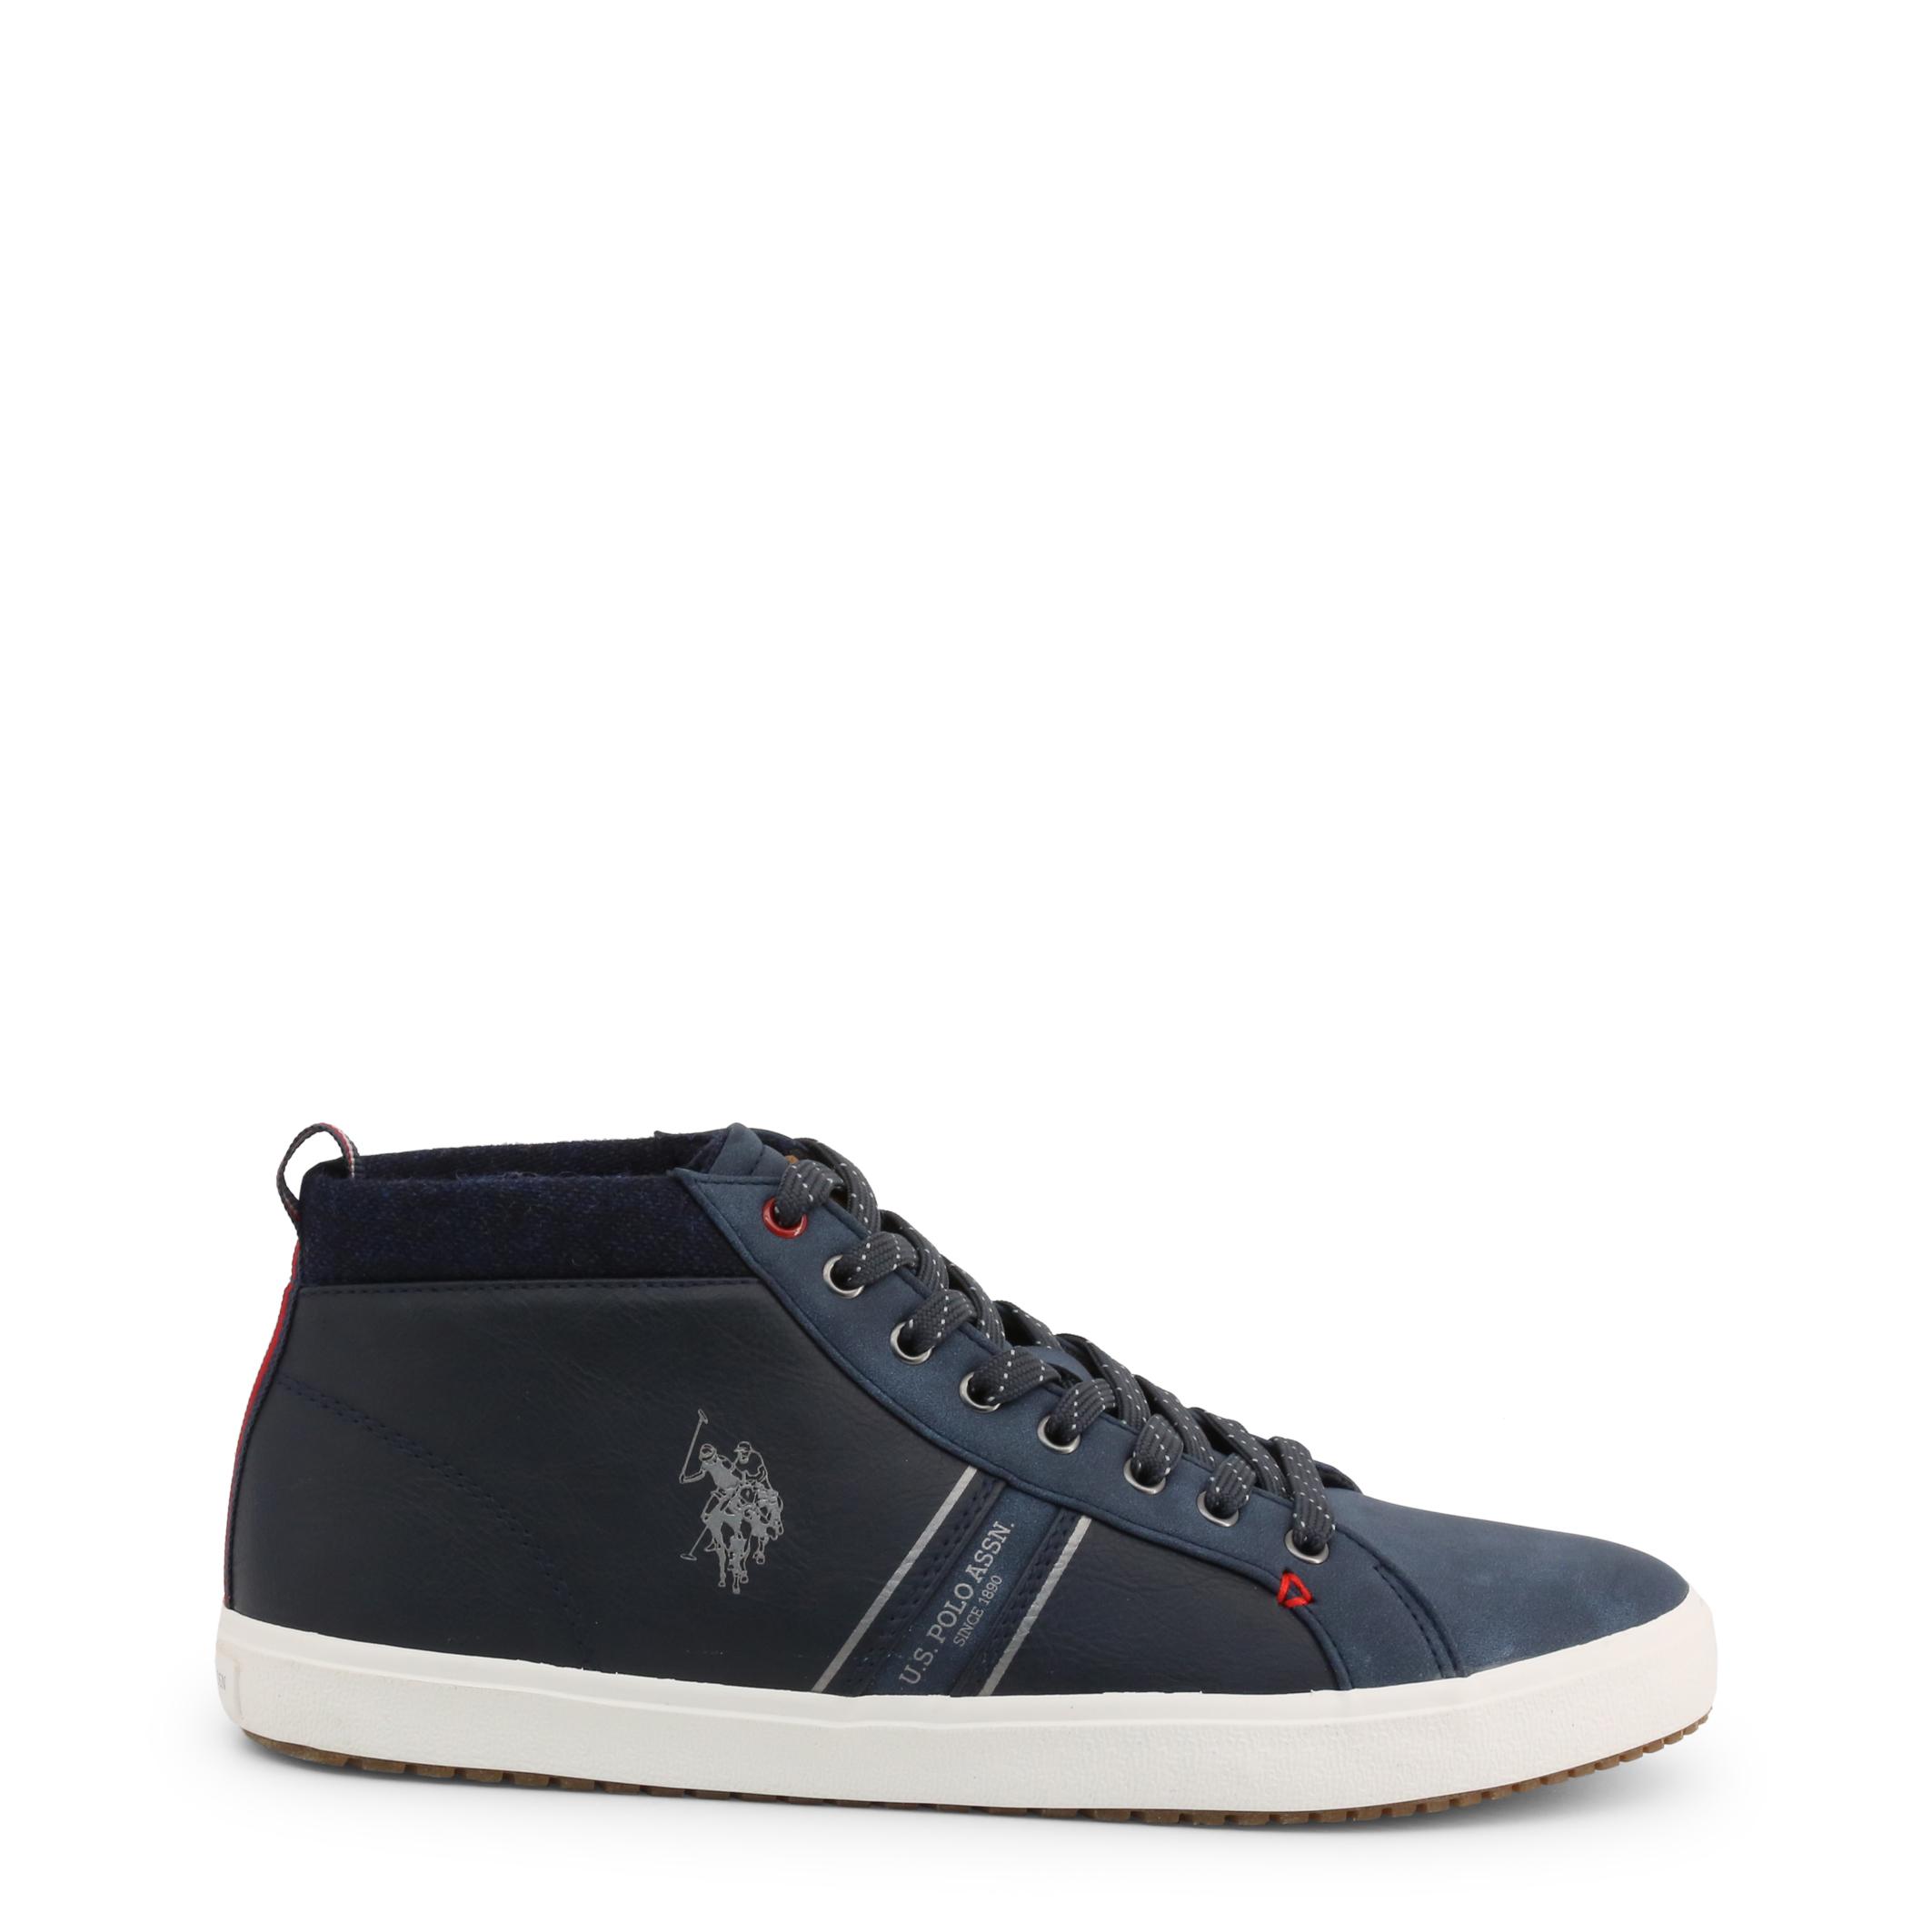 Chaussures de ville  U.S. Polo Assn. WOUCK7147W9_Y1_DKBL blue